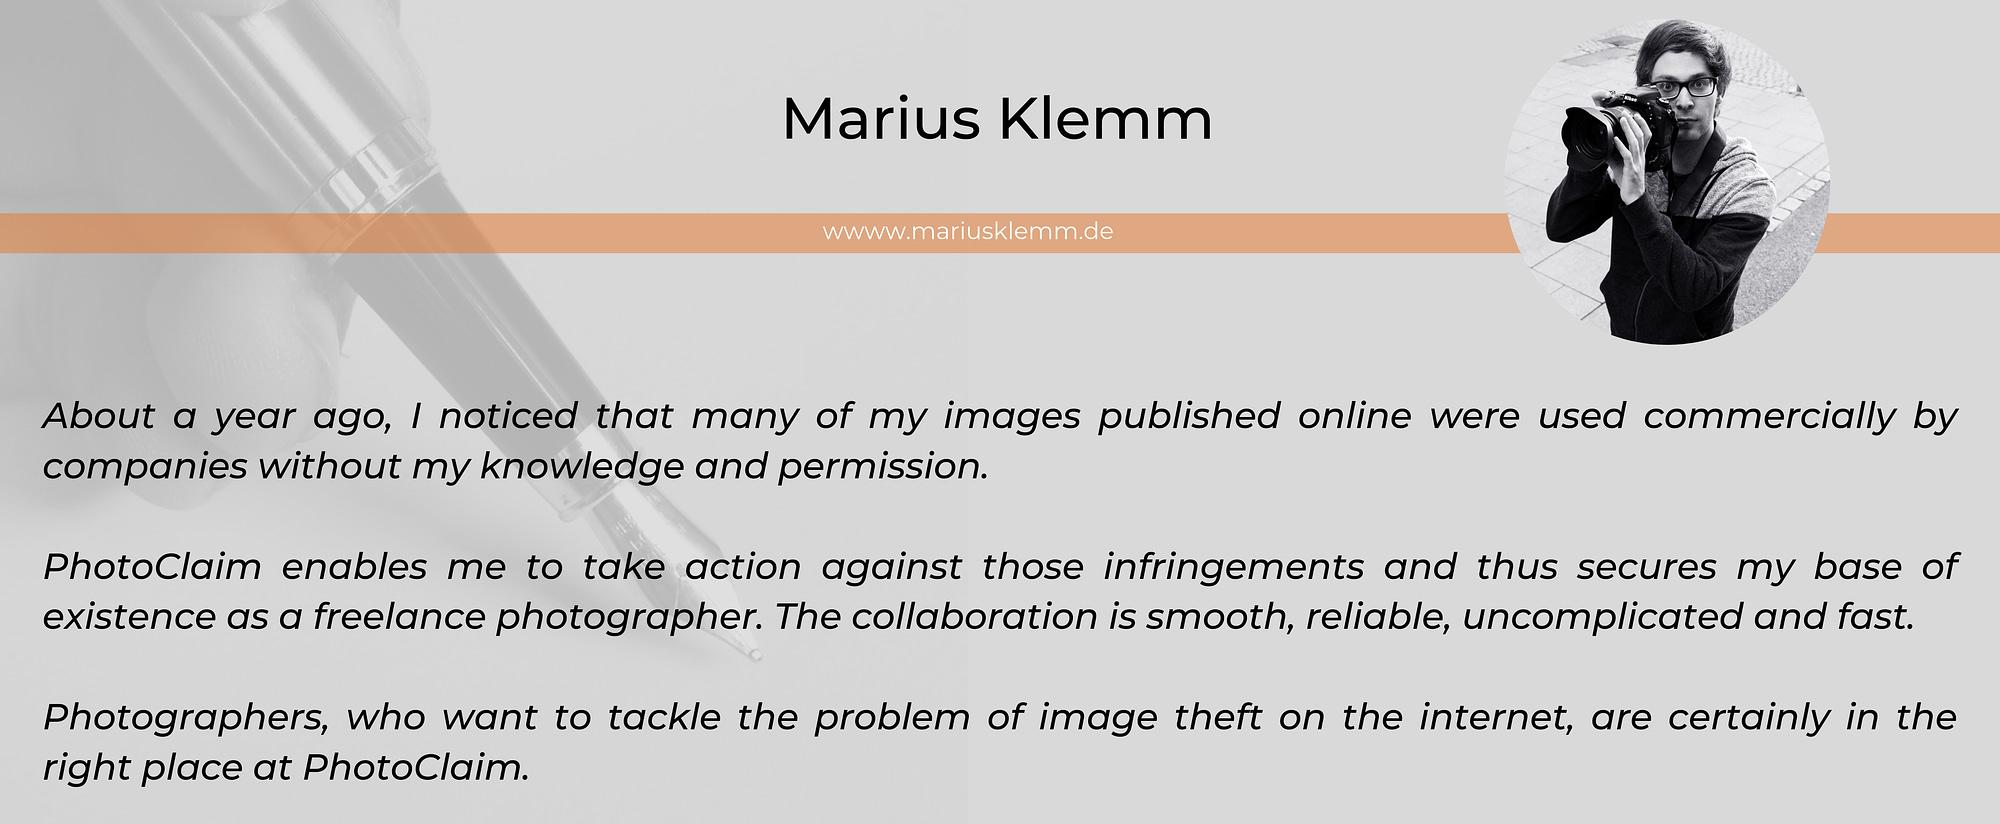 Marius Klemm photographer